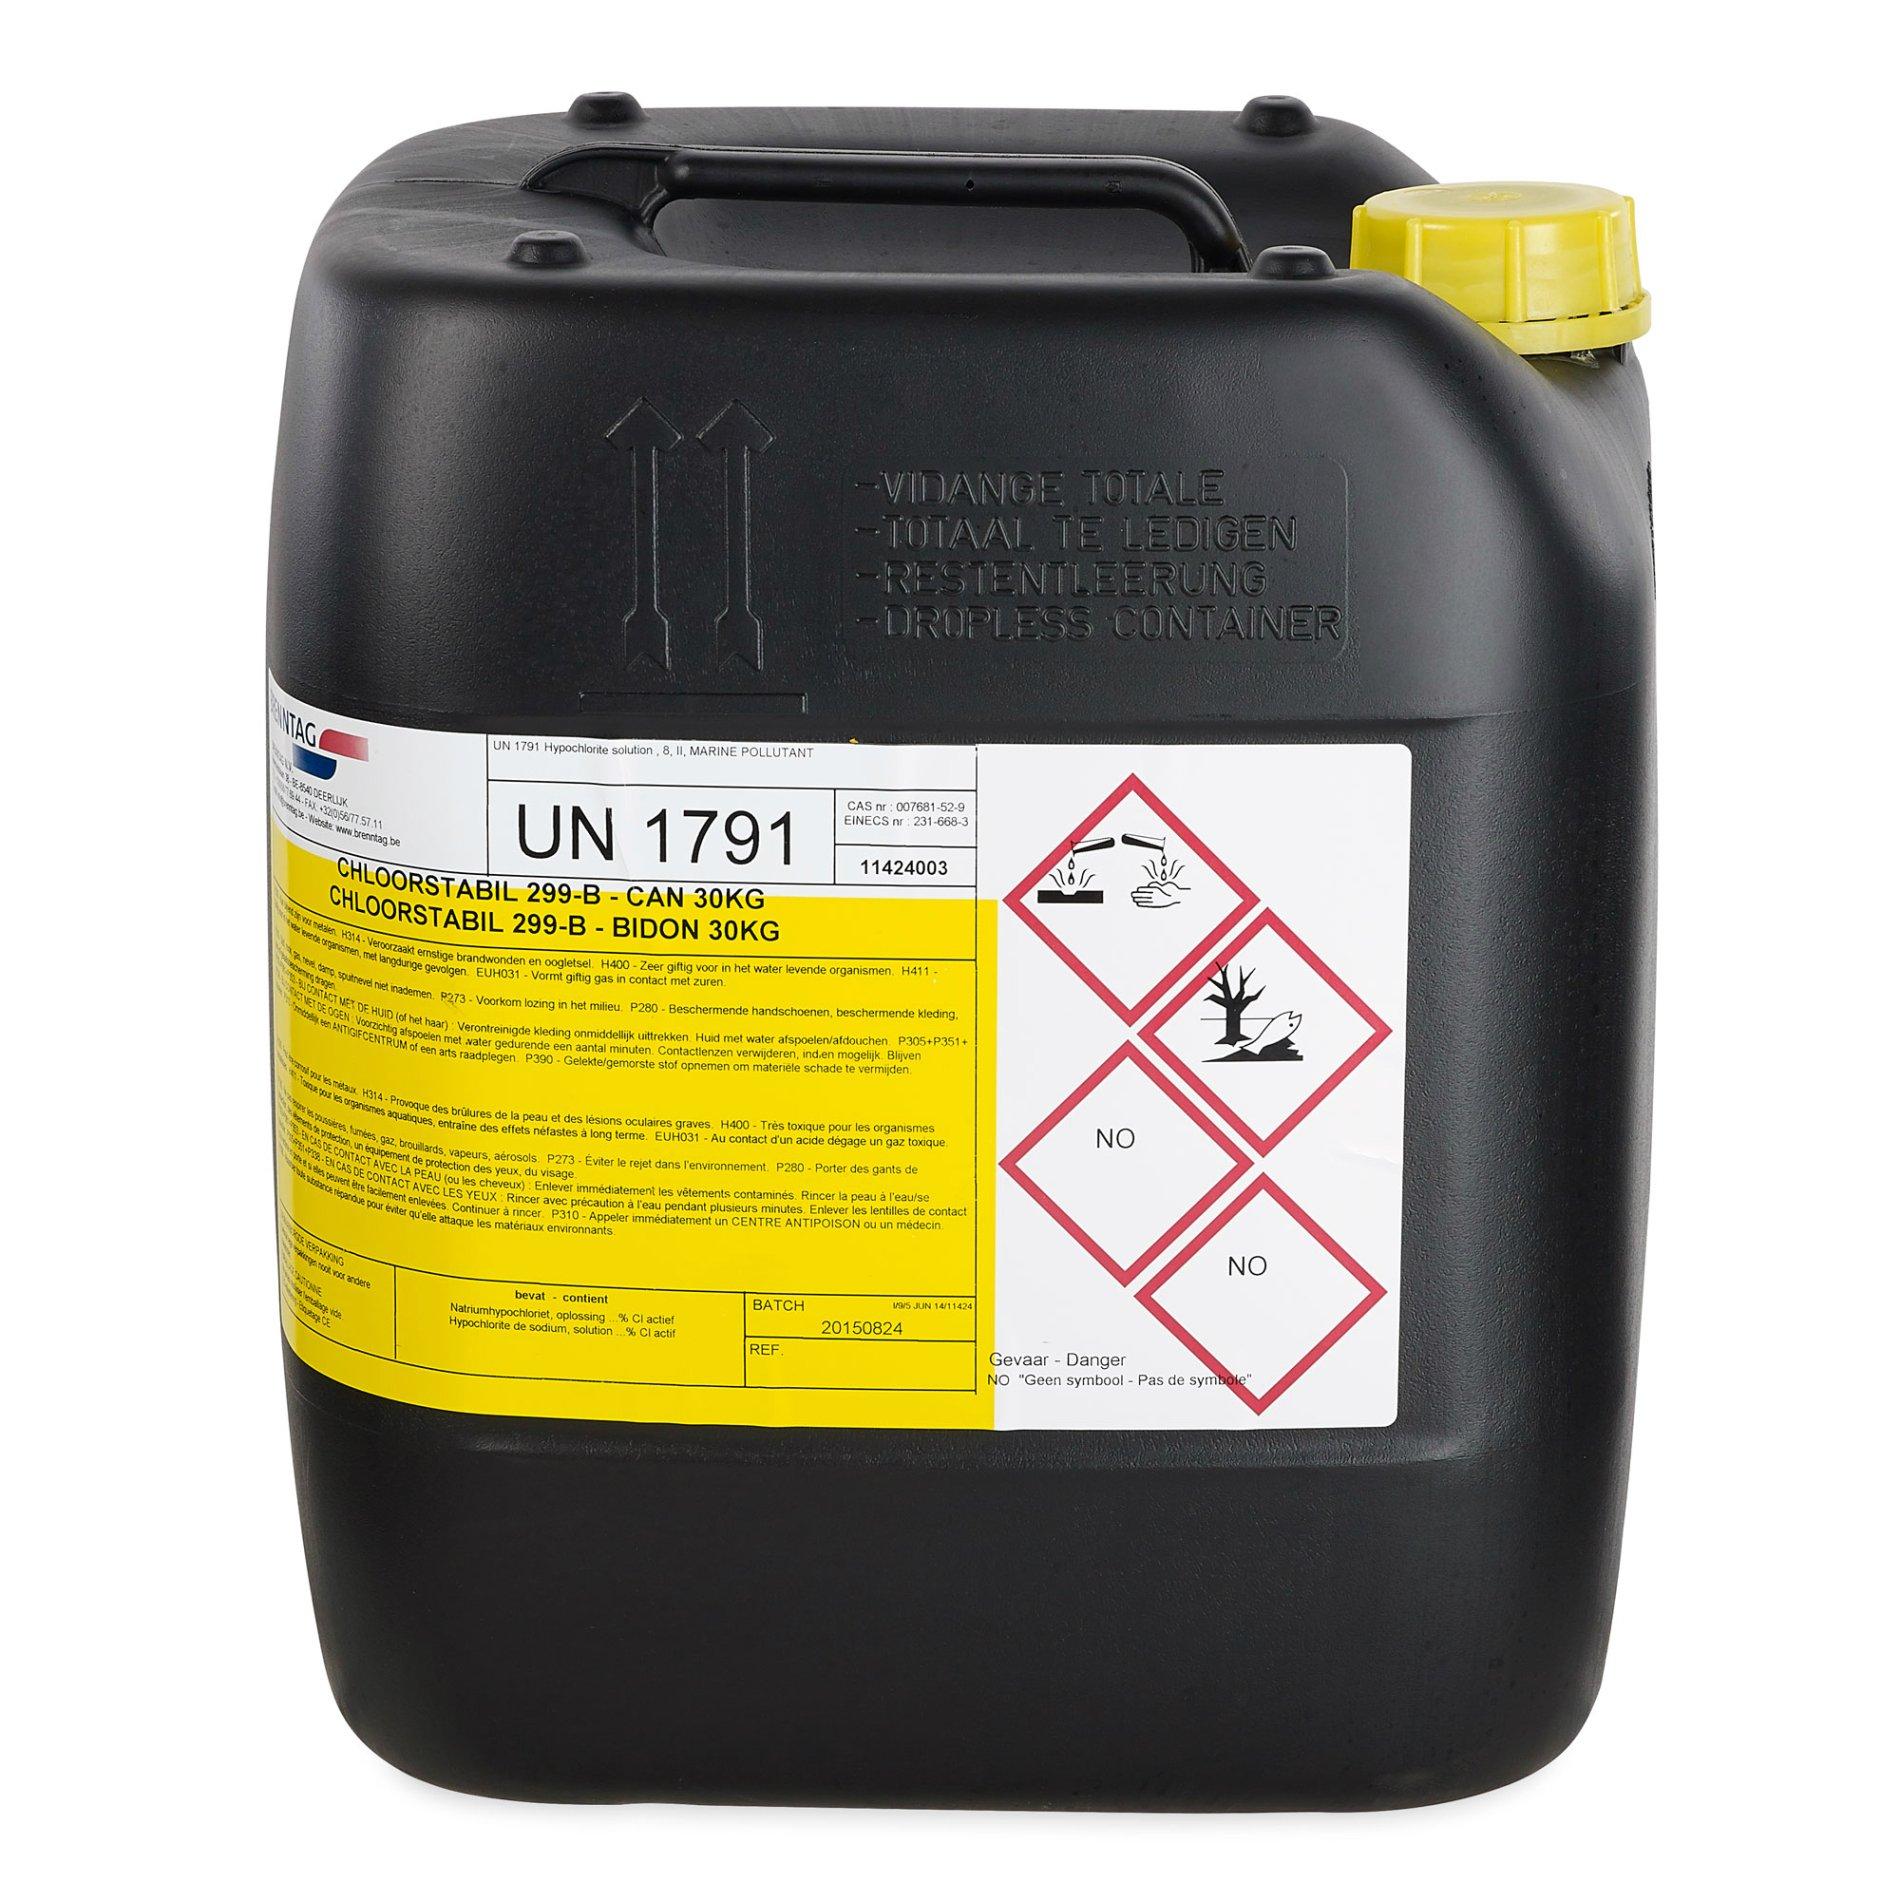 Genoeg Chloorstabil 299-B 20 liter | Zwembad.be CJ46